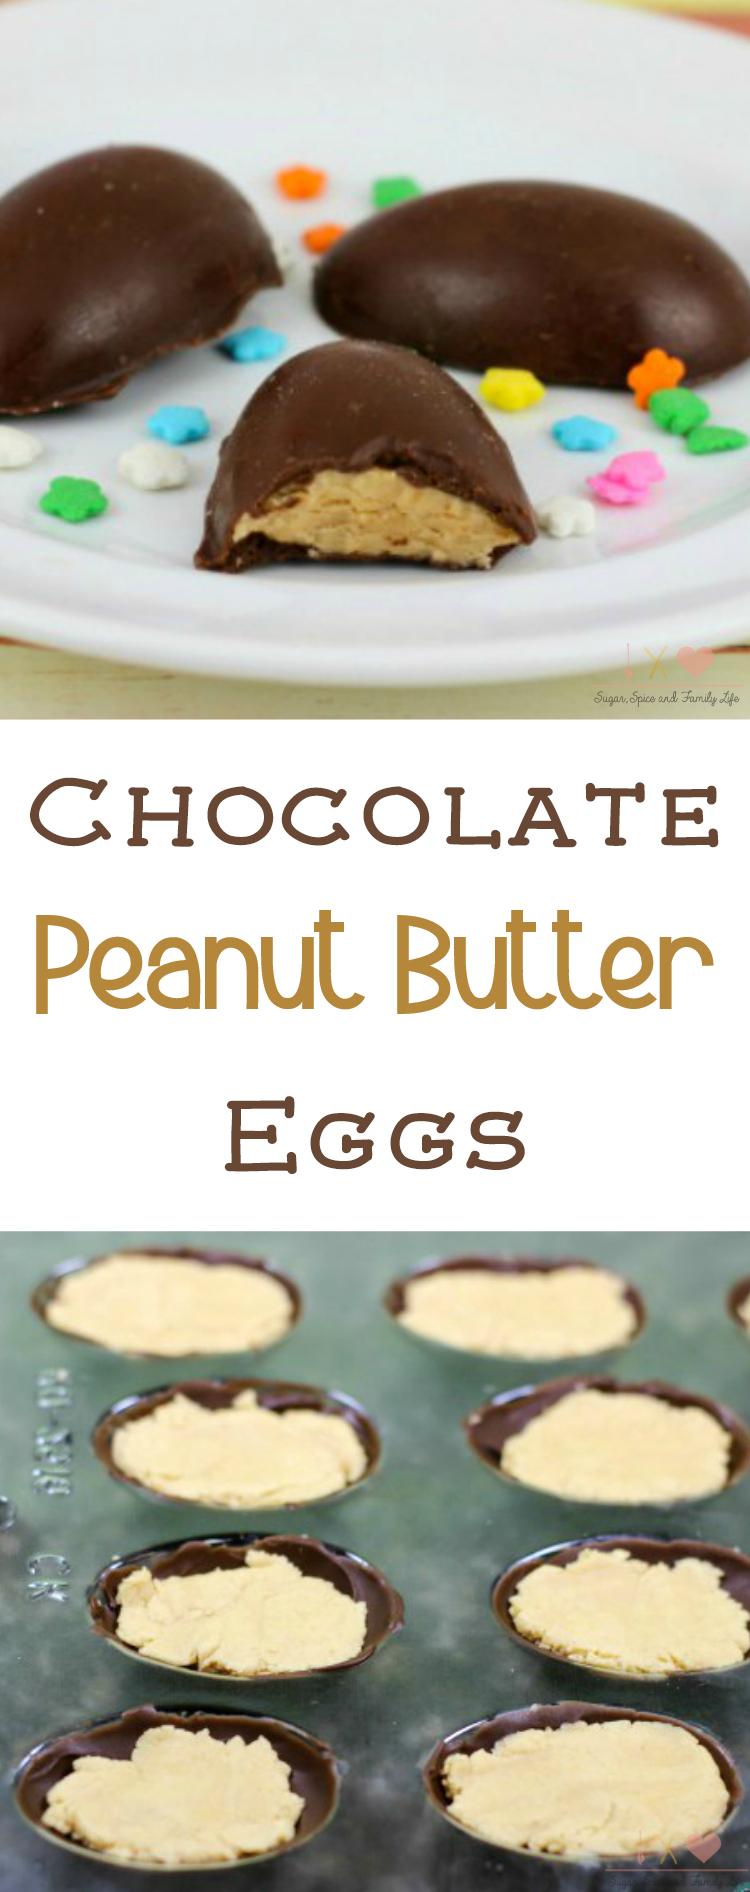 Chocolate Peanut Butter Eggs Recipe